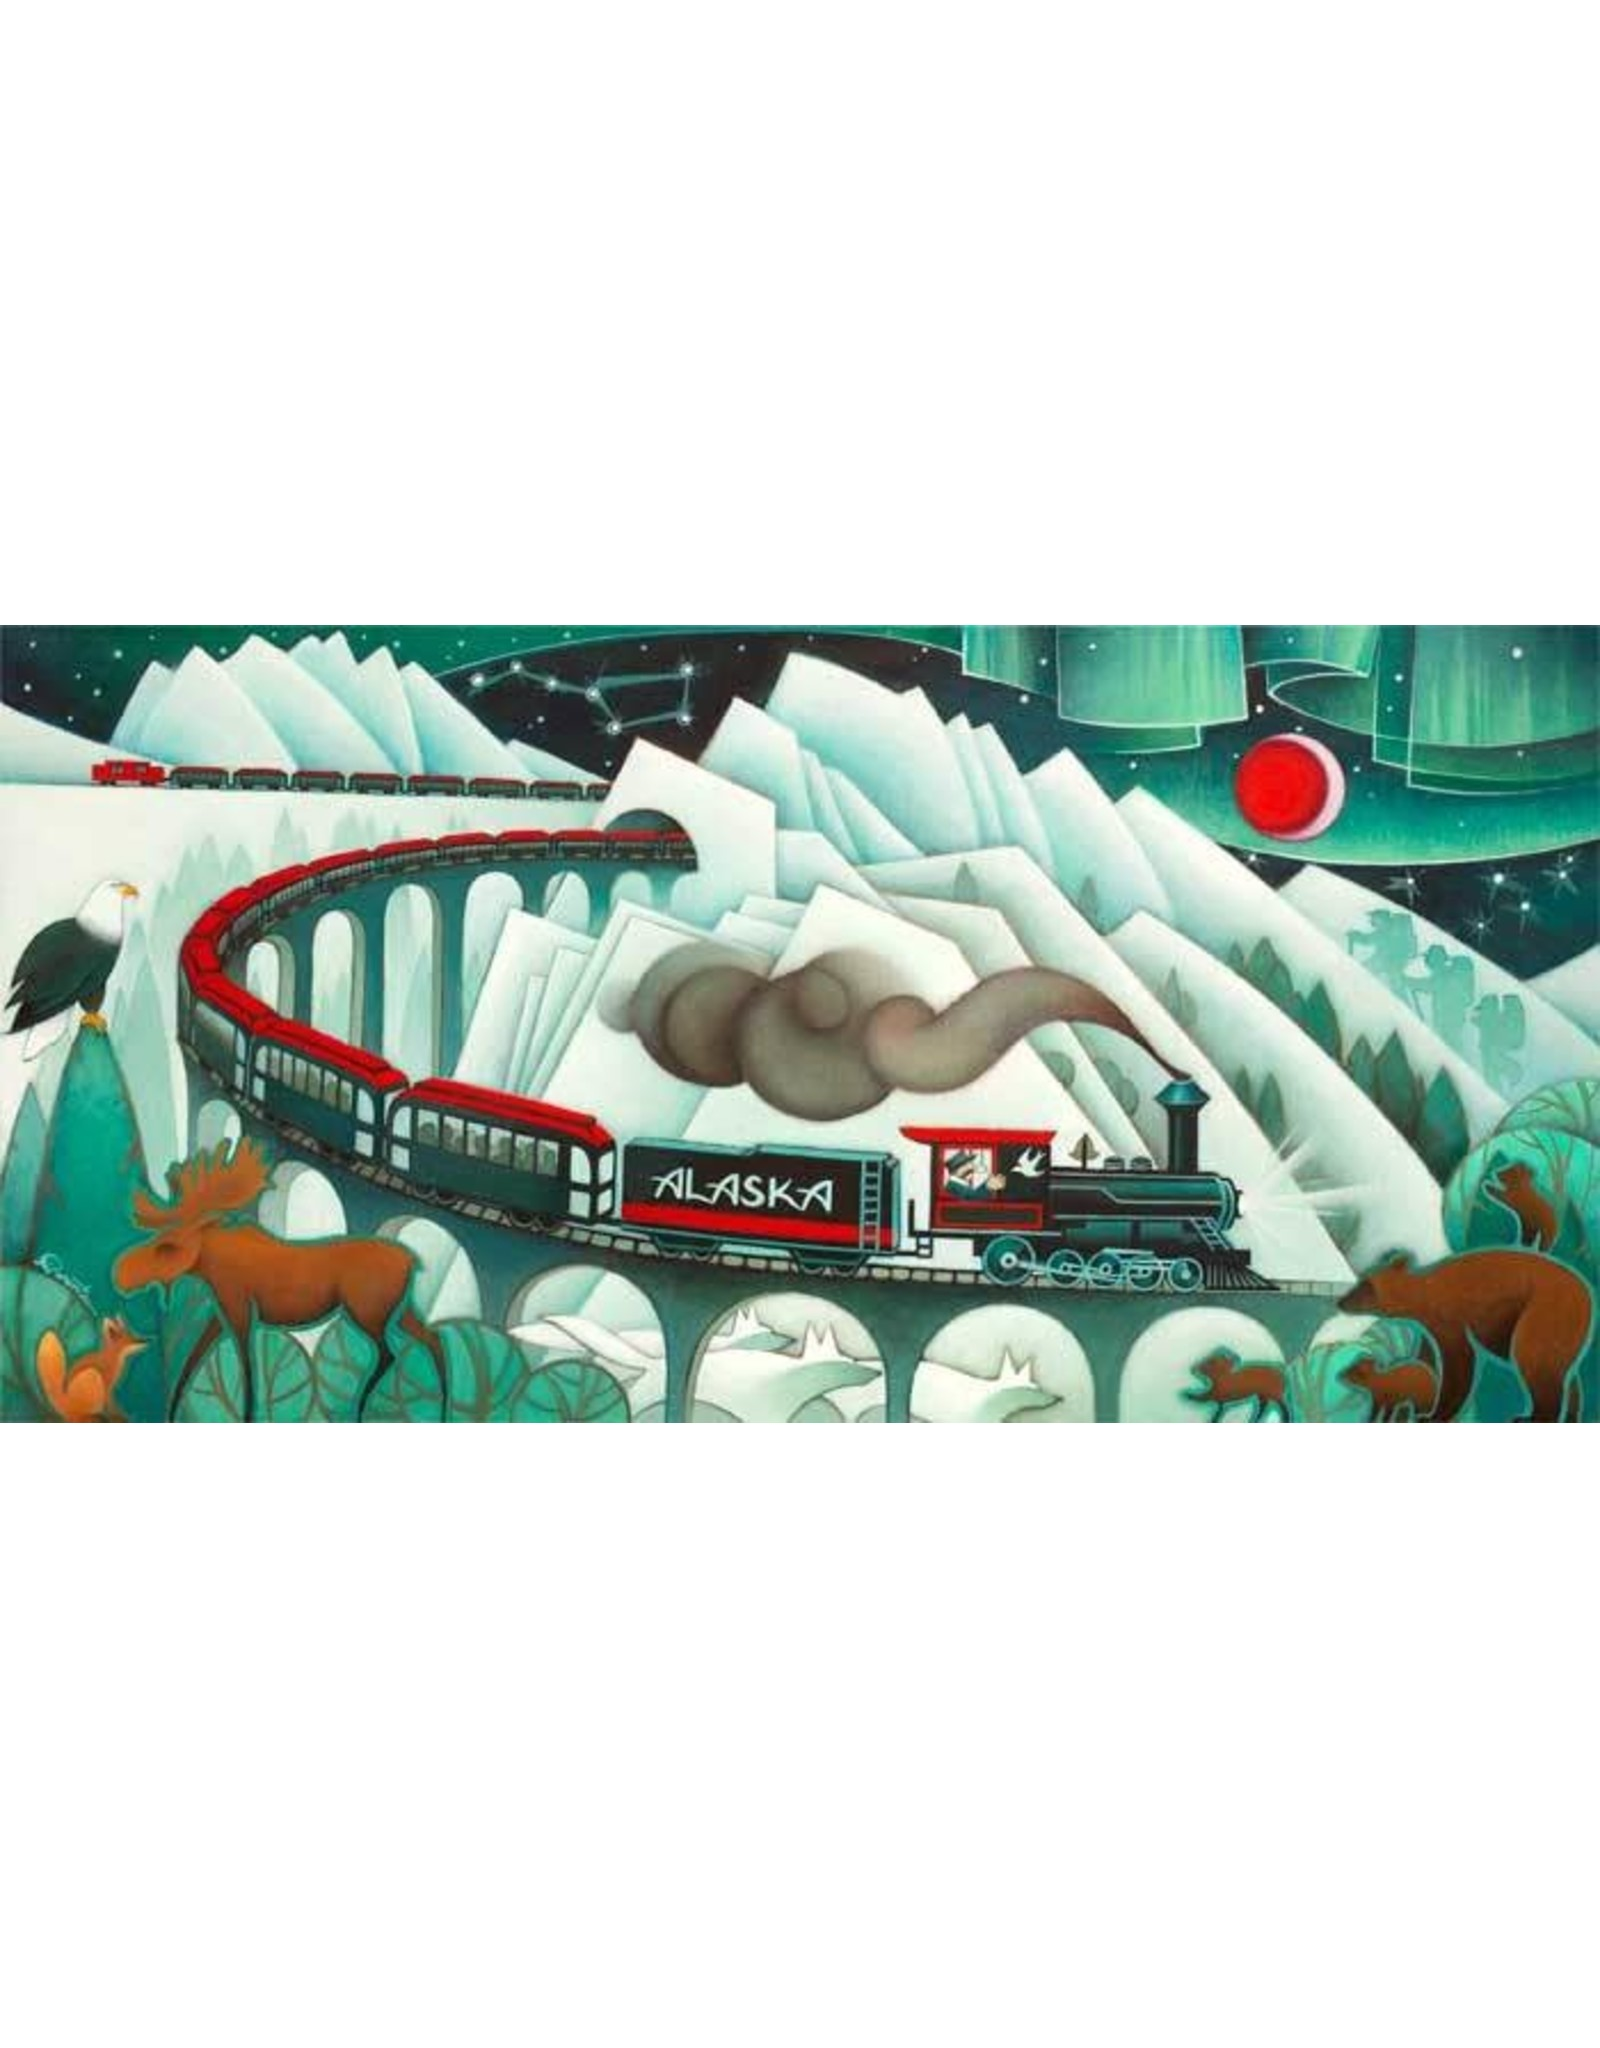 Nathalie Parenteau Trains of Alaska | Nathalie Parenteau